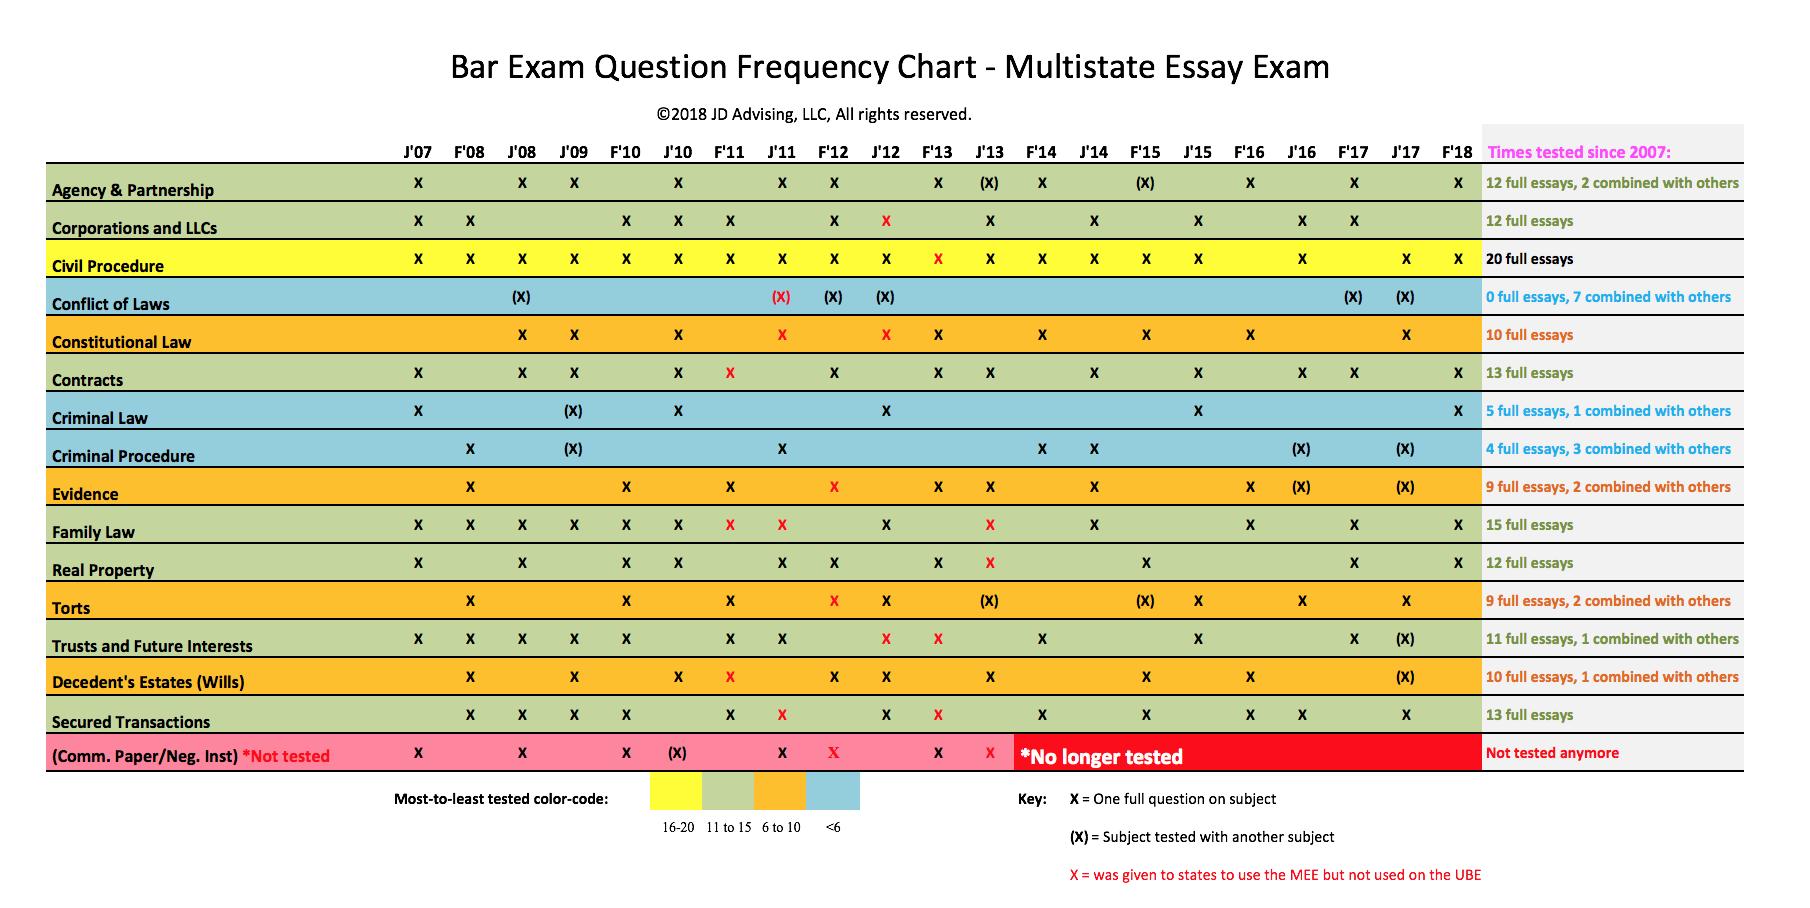 010 Mee Frequency Chart 2018 California Bar Essays Essay Marvelous July 2017 Exam Graded February Full